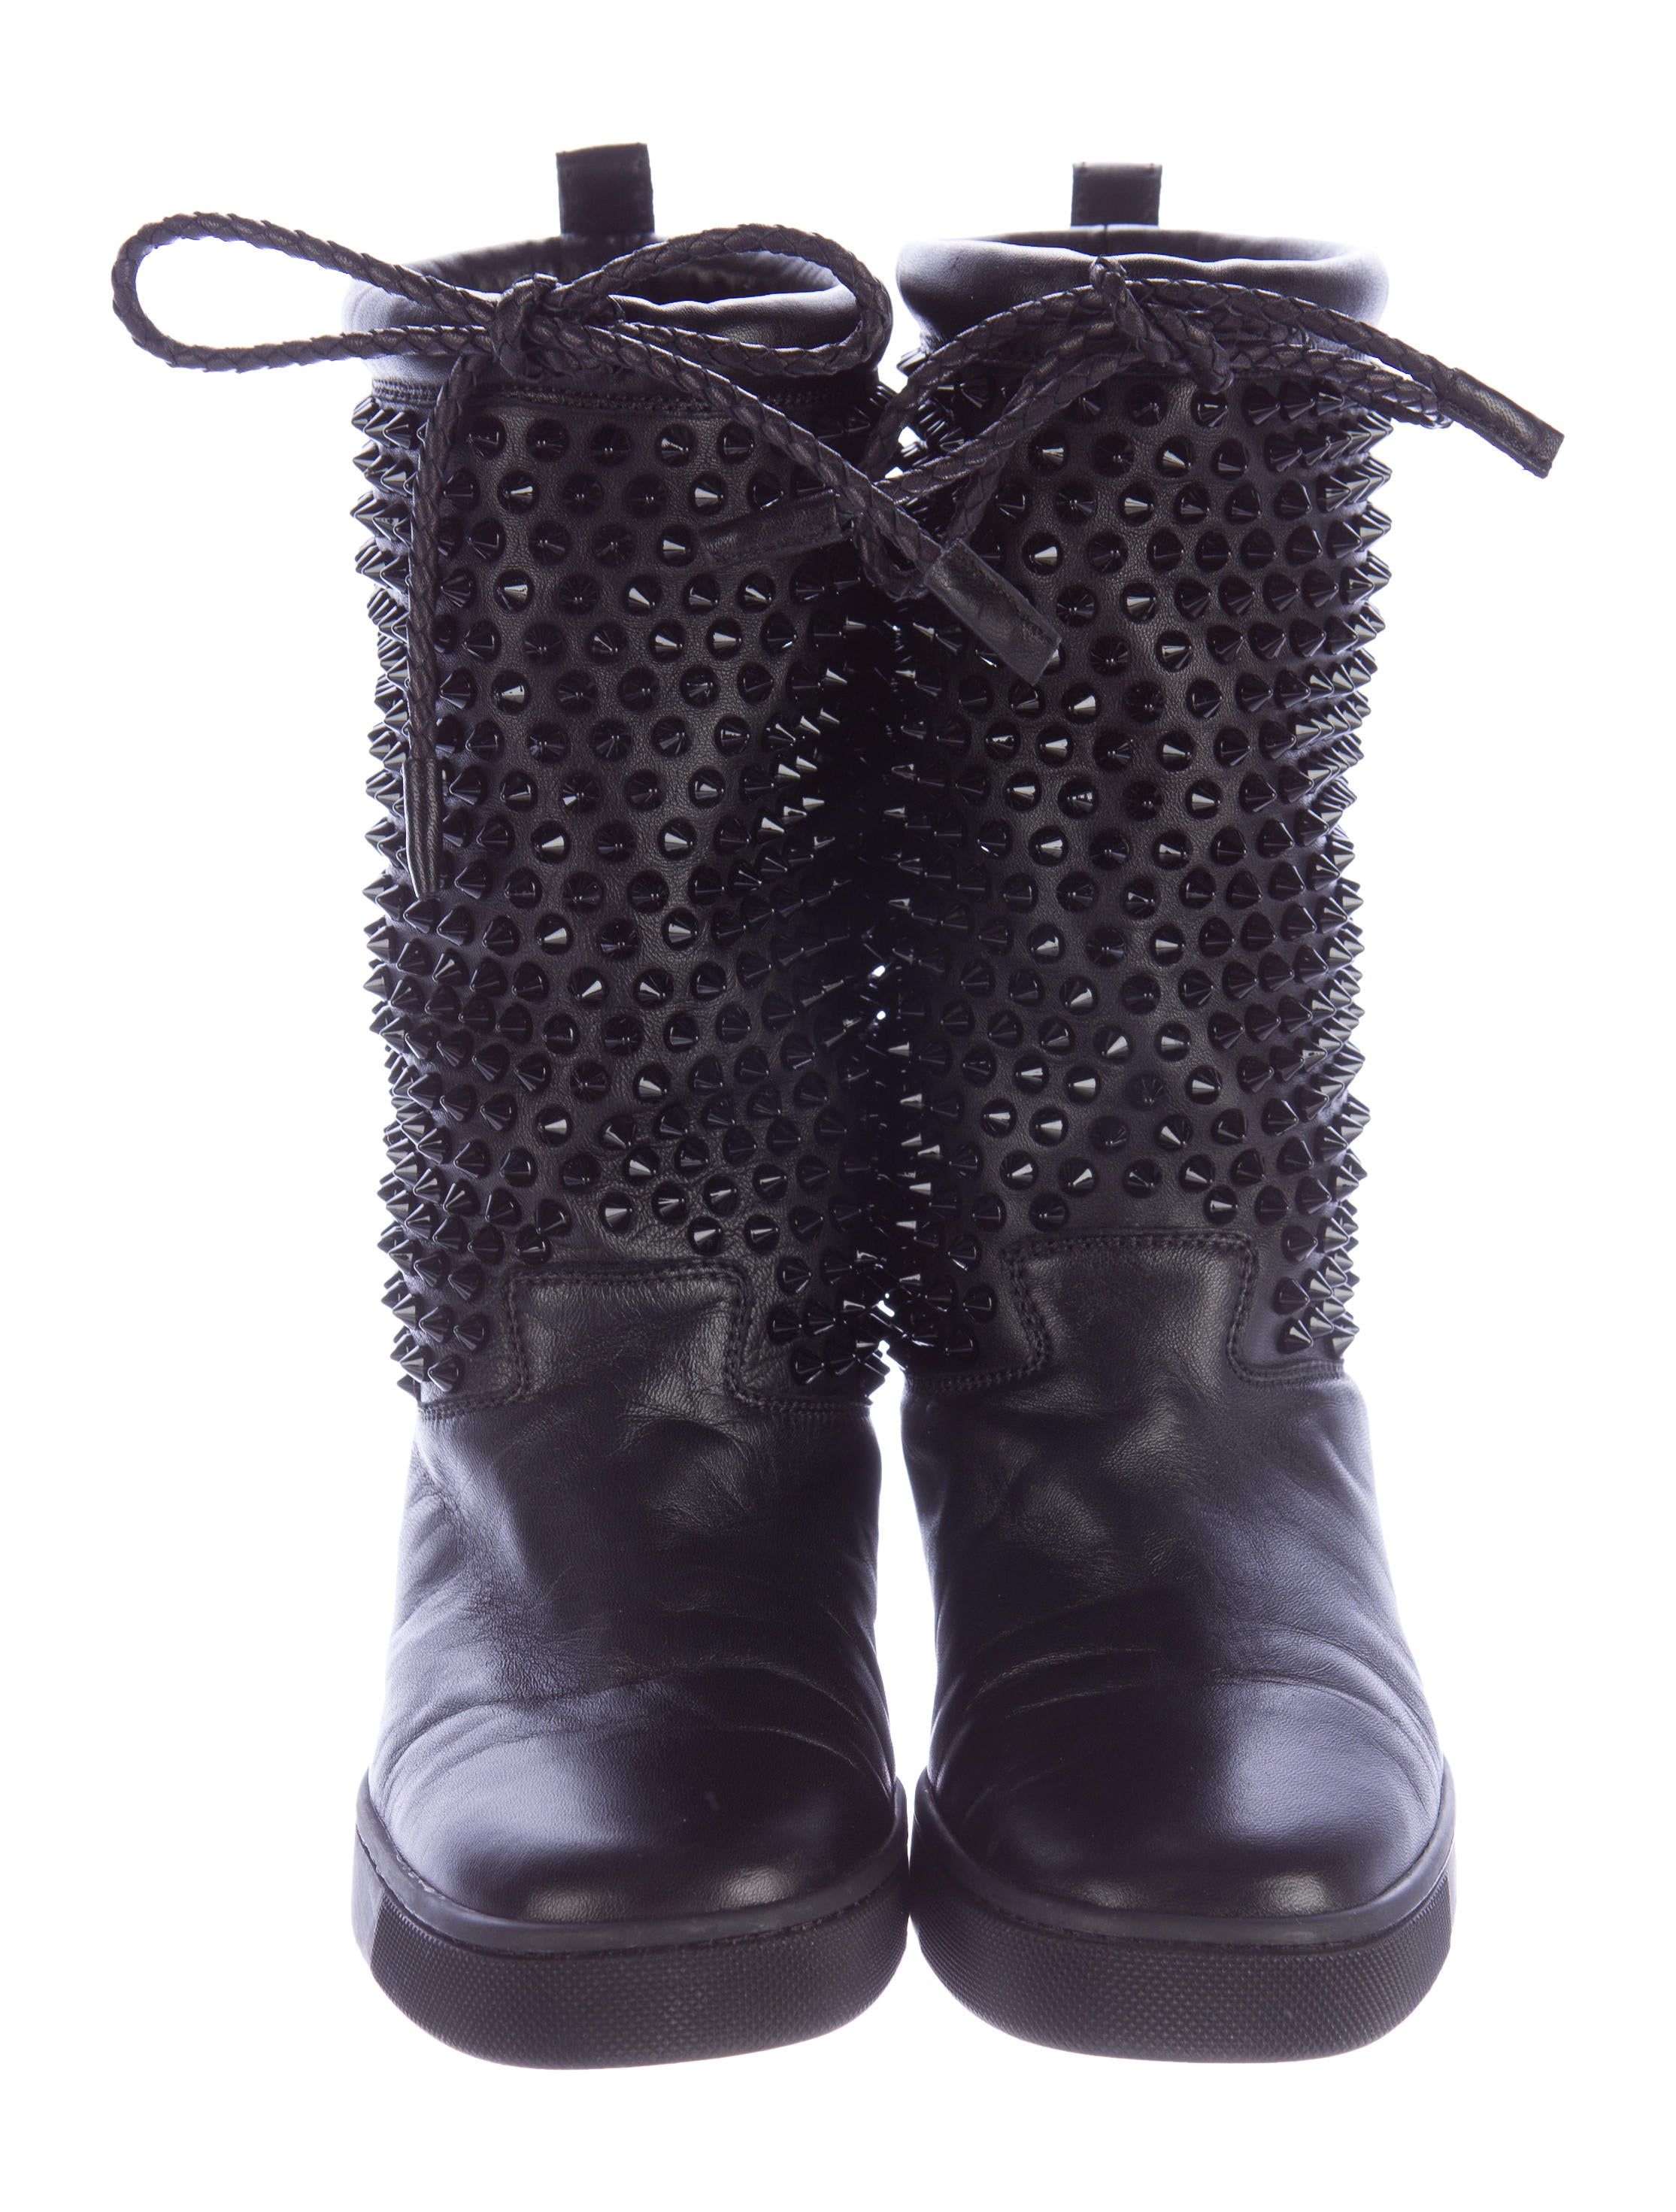 38e54e36fdf Women's Christian Louboutin Size 11 Shoes Faux Louis Vuitton Shoes ...